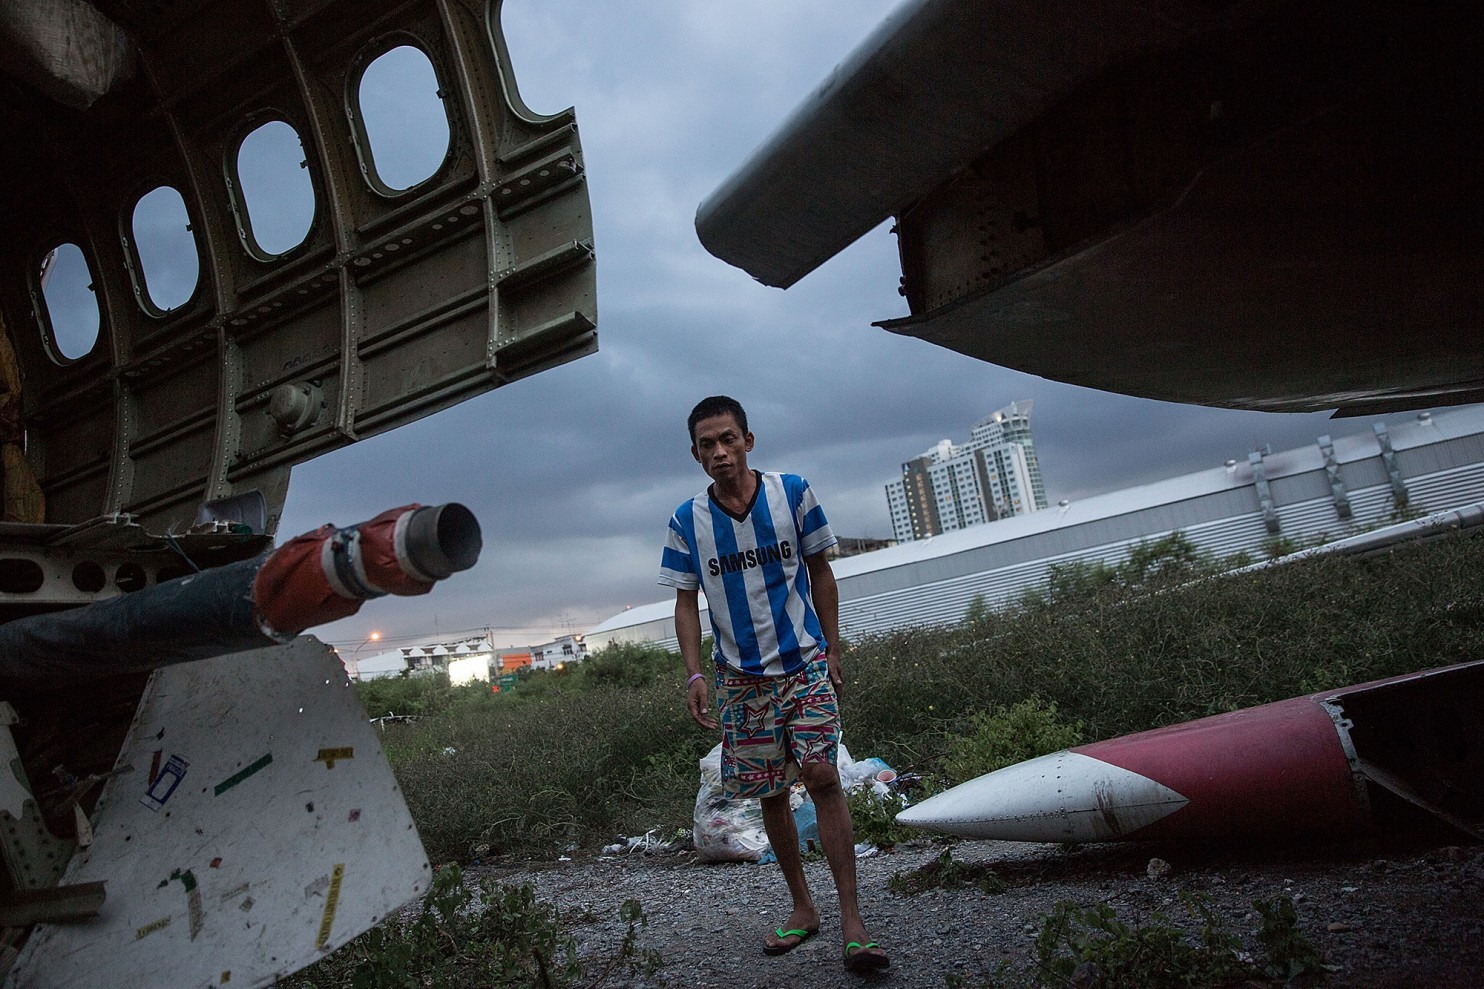 bangkok-airplanes-home-11